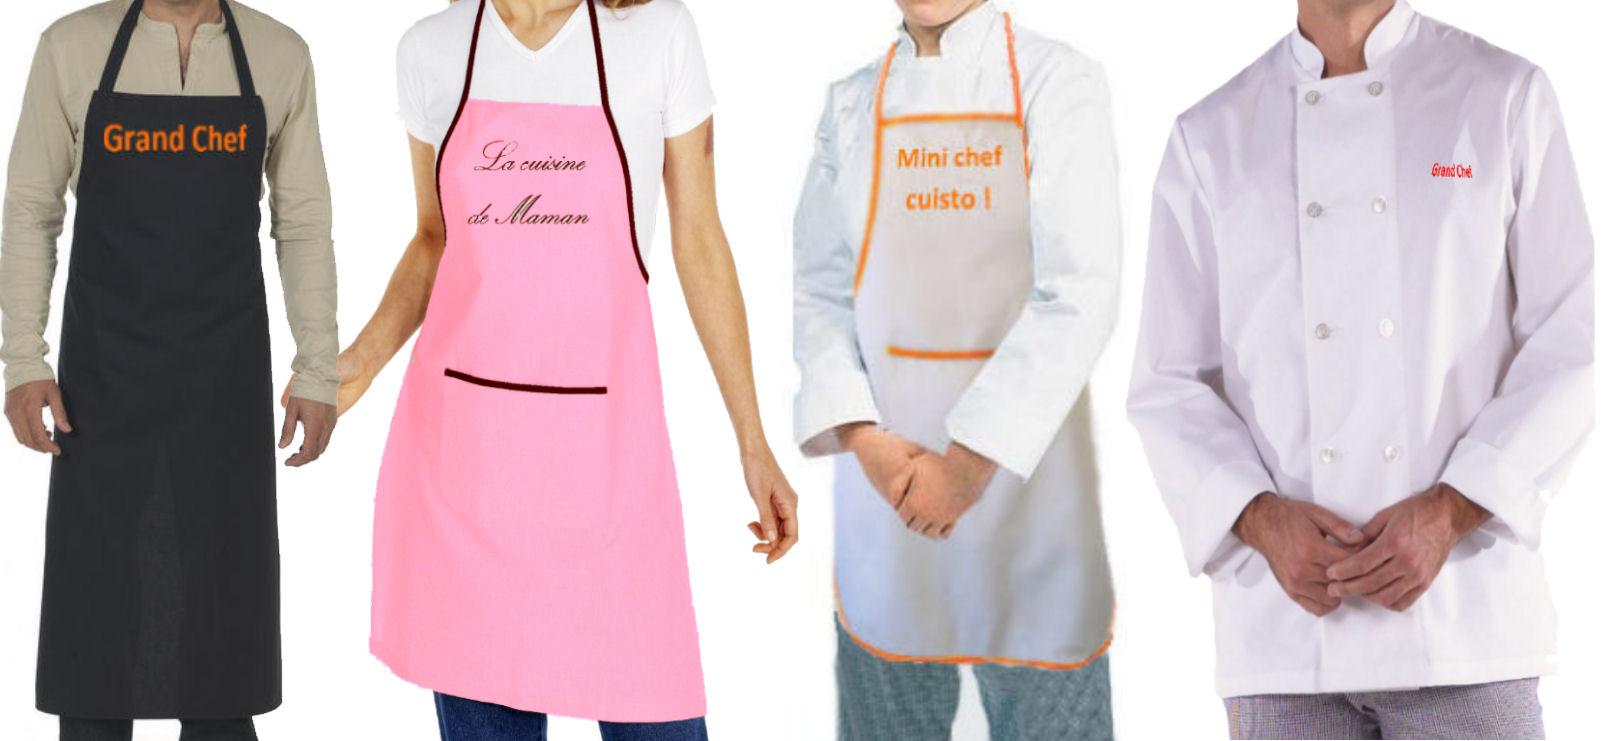 vestes de cuisine. veste cuisine veste cuisinier. vtements ... - Vetements De Cuisine